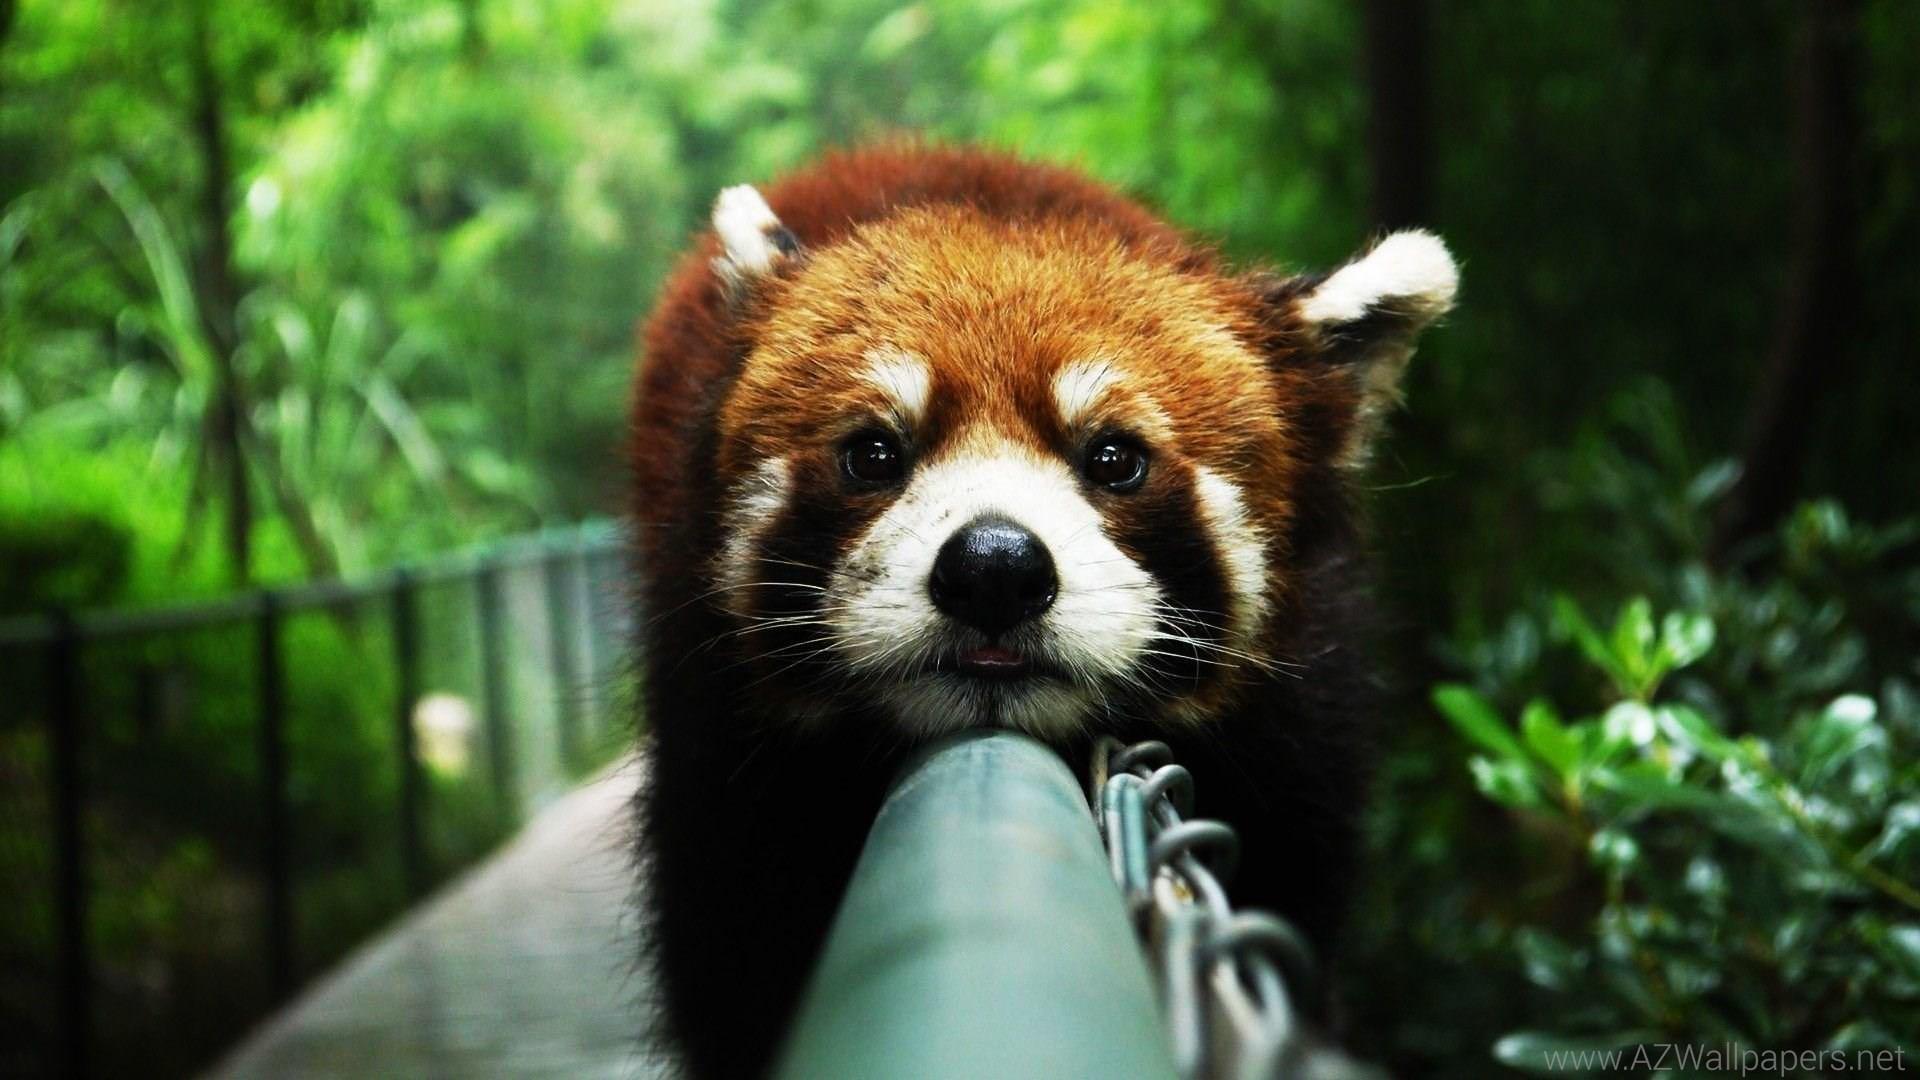 Panda Wallpapers For Facebook Desktop Background